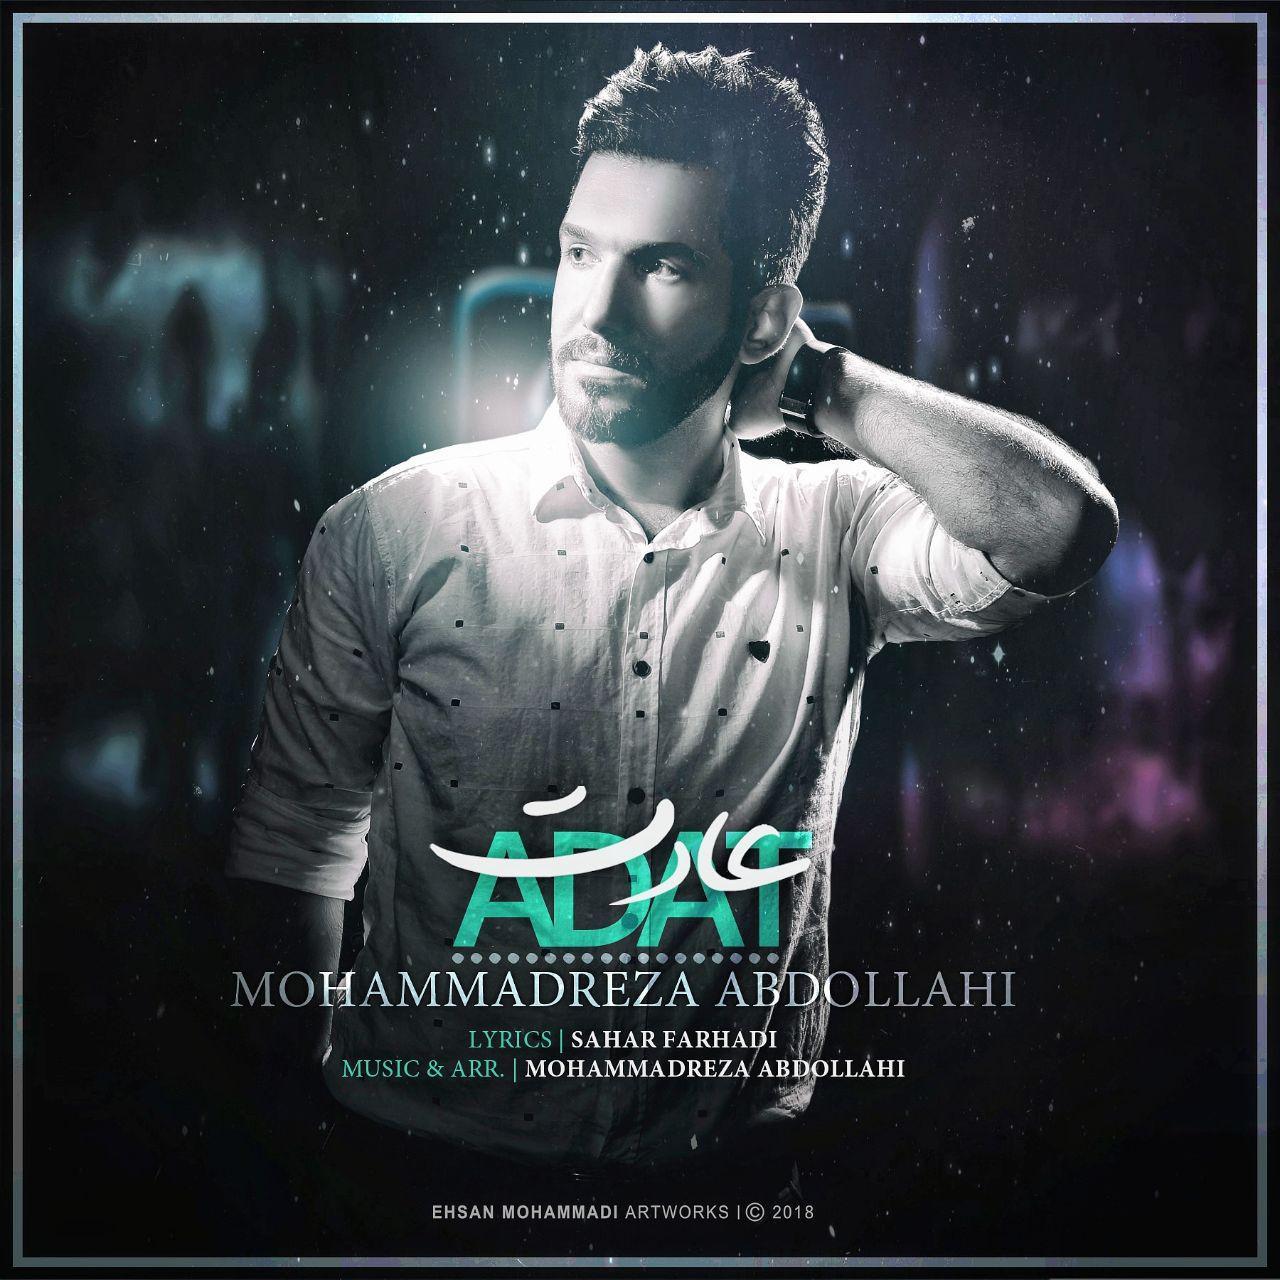 Mohammadreza Abdollahi – Adat